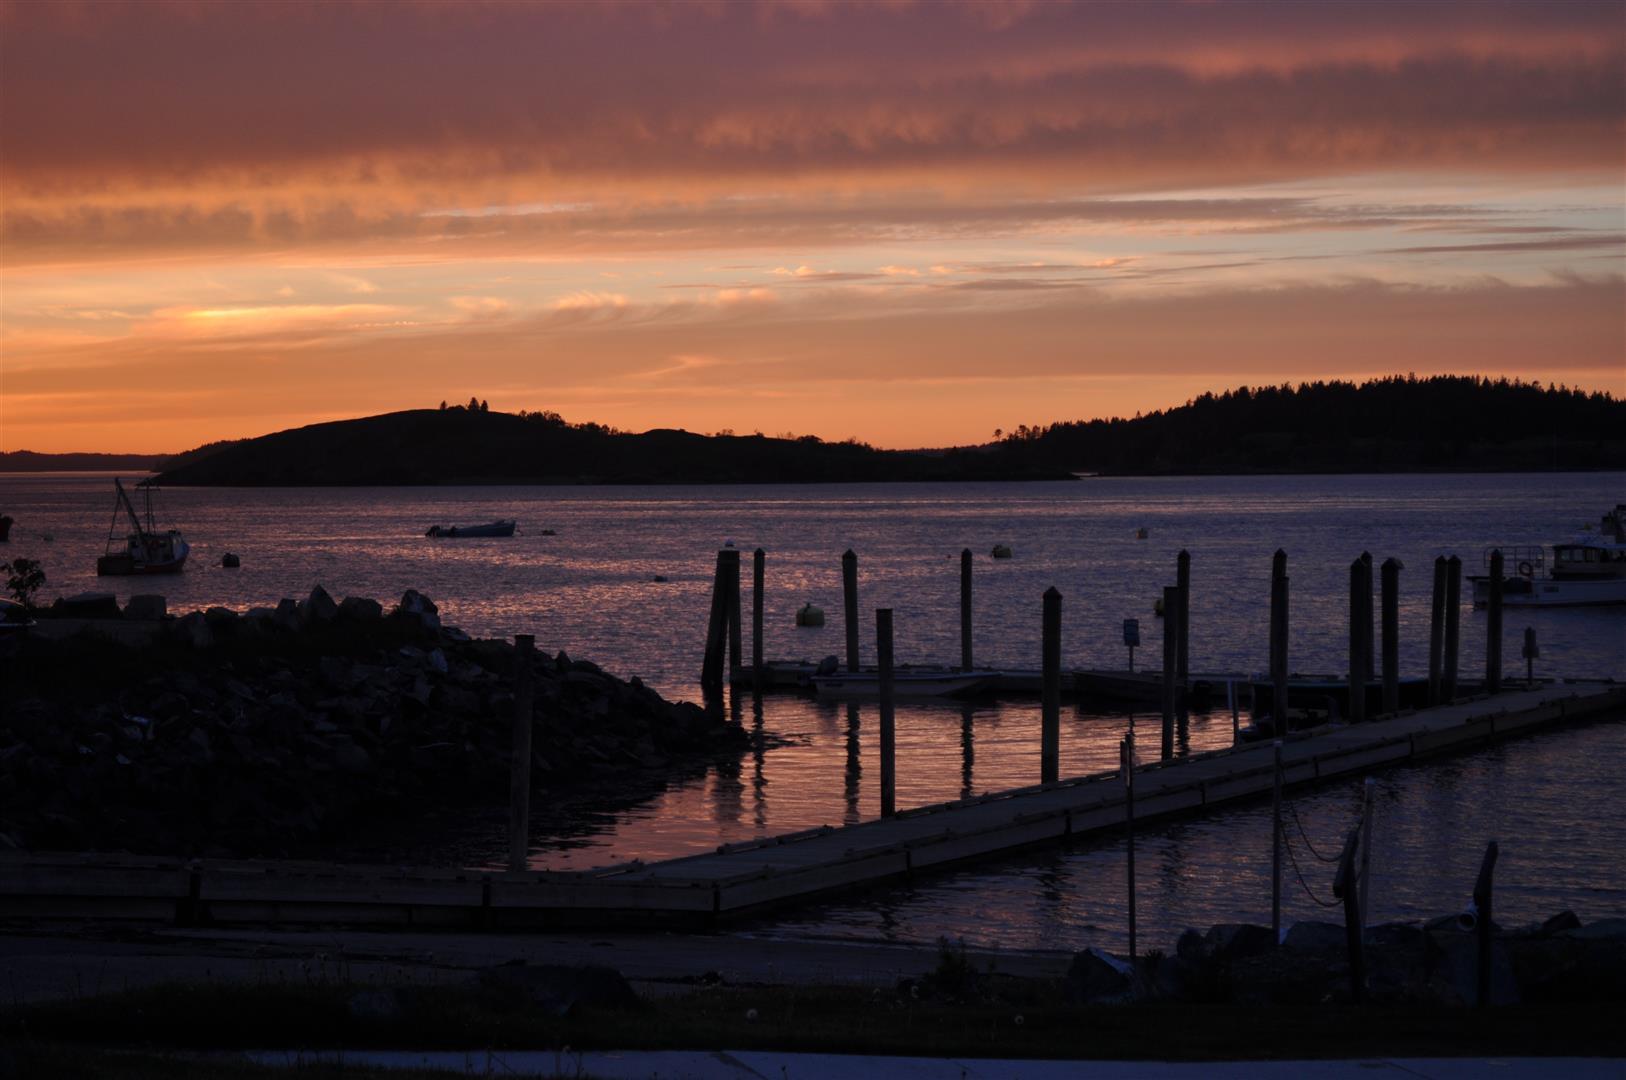 Sunset, Lubec, ME 1